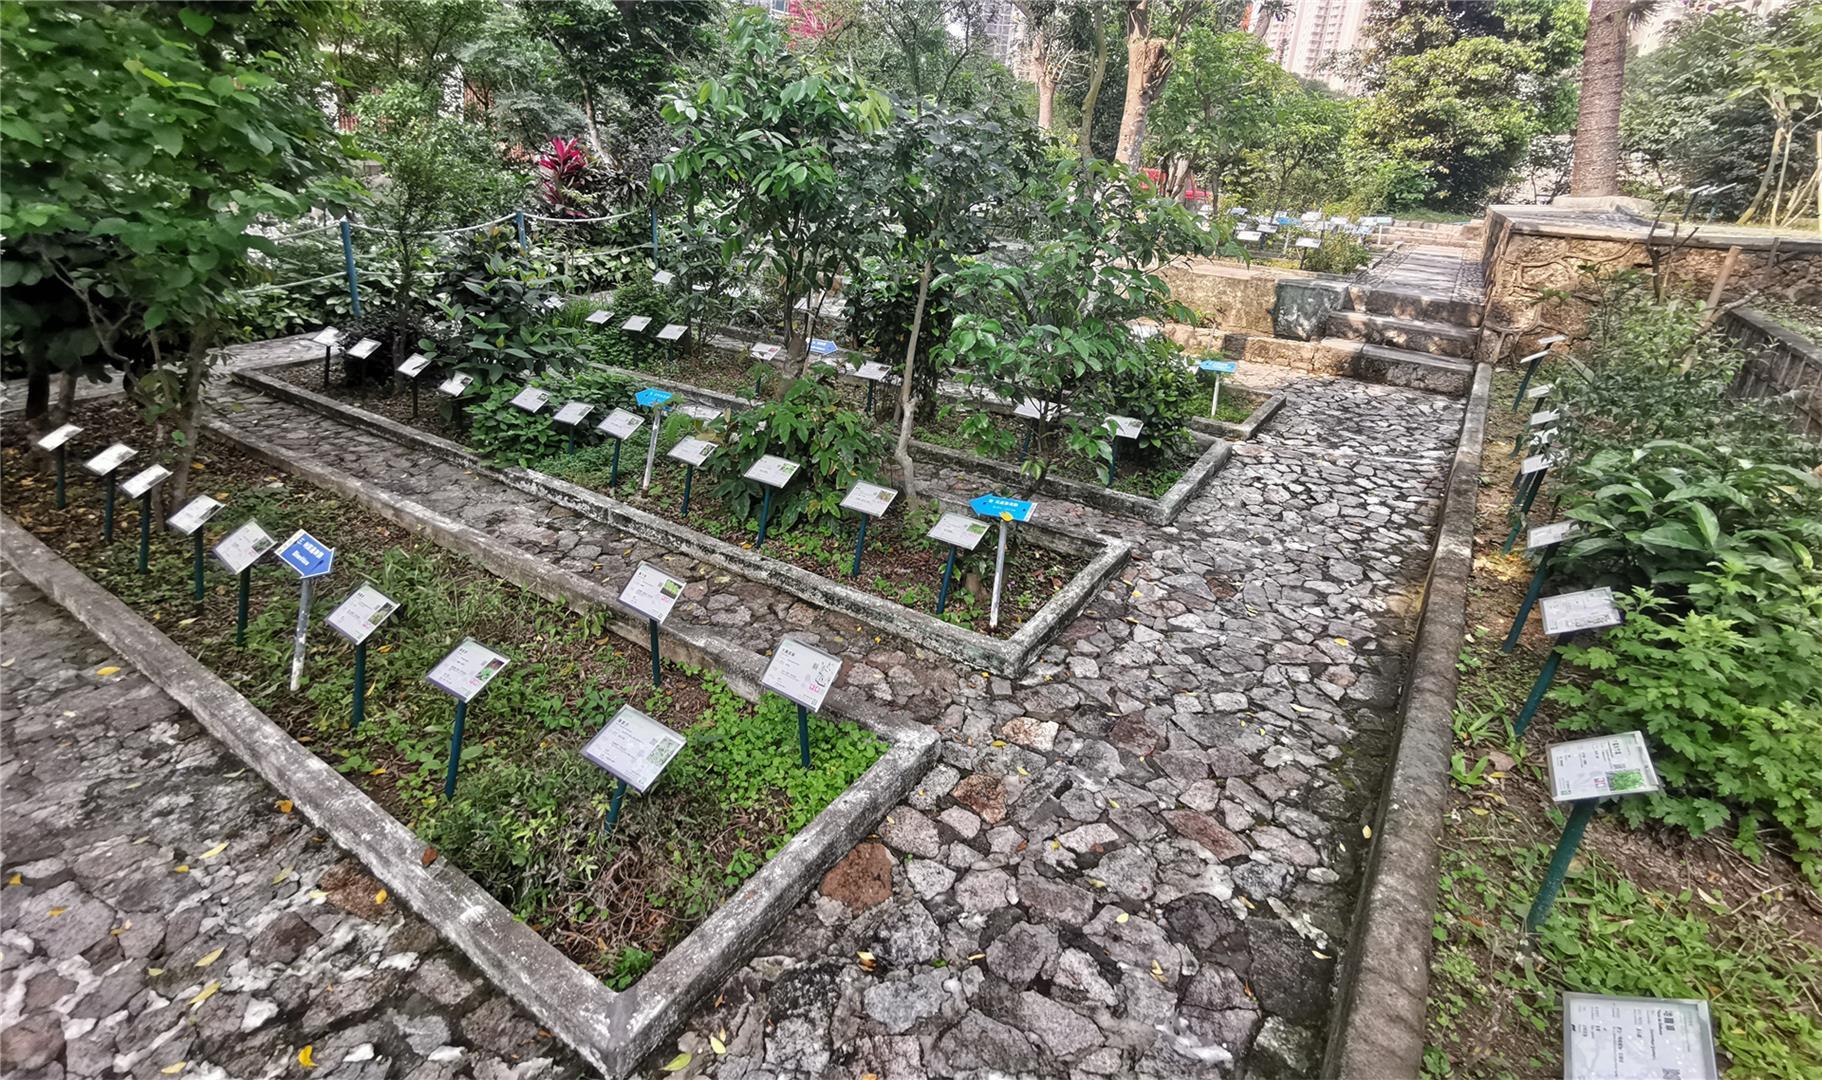 Garden of Medicinal Plants